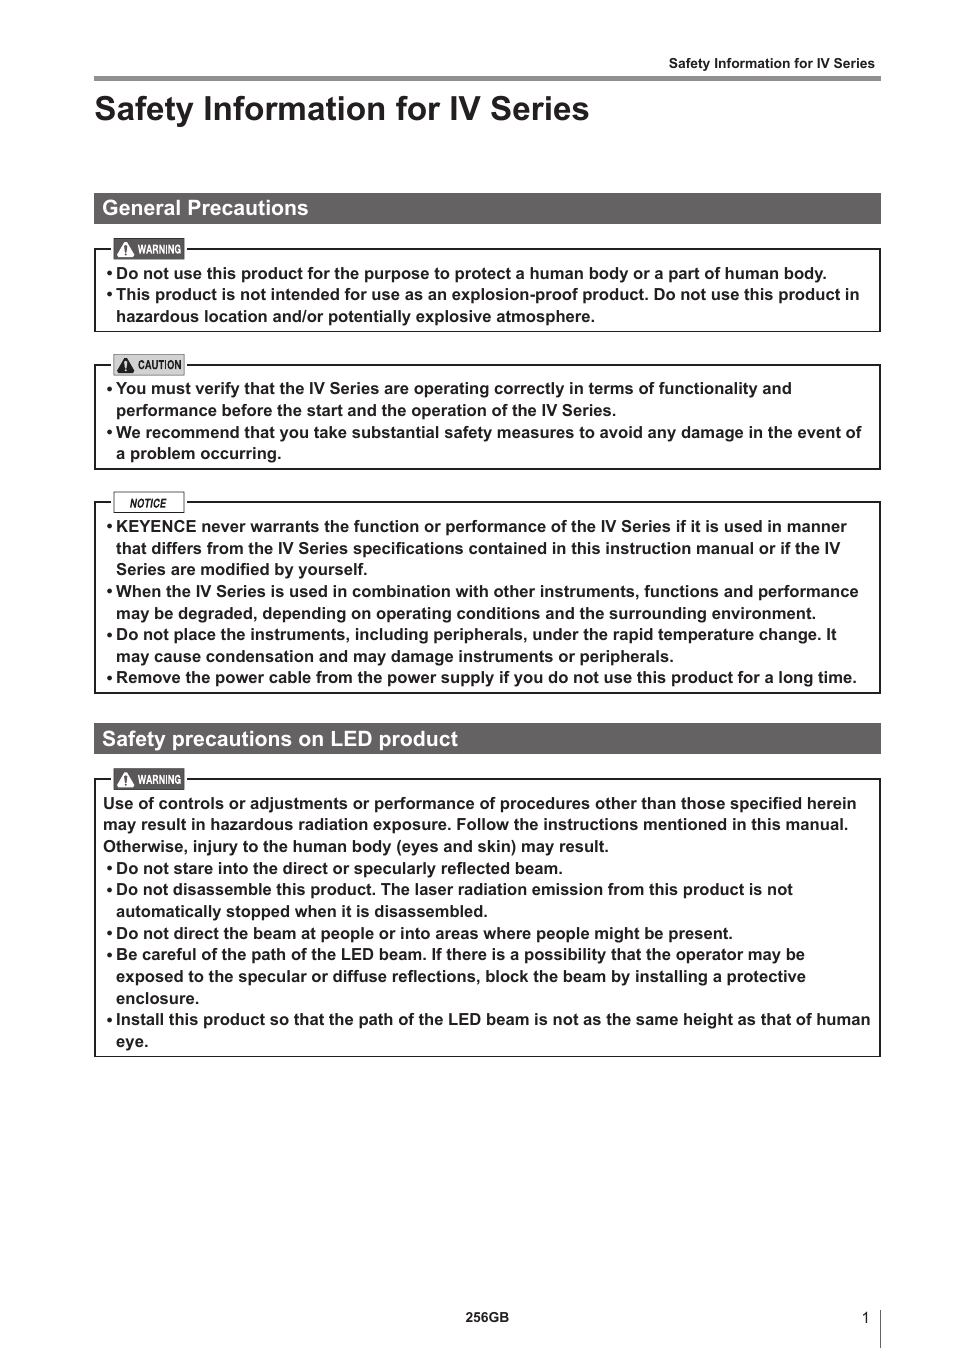 Keyence iv series user manual